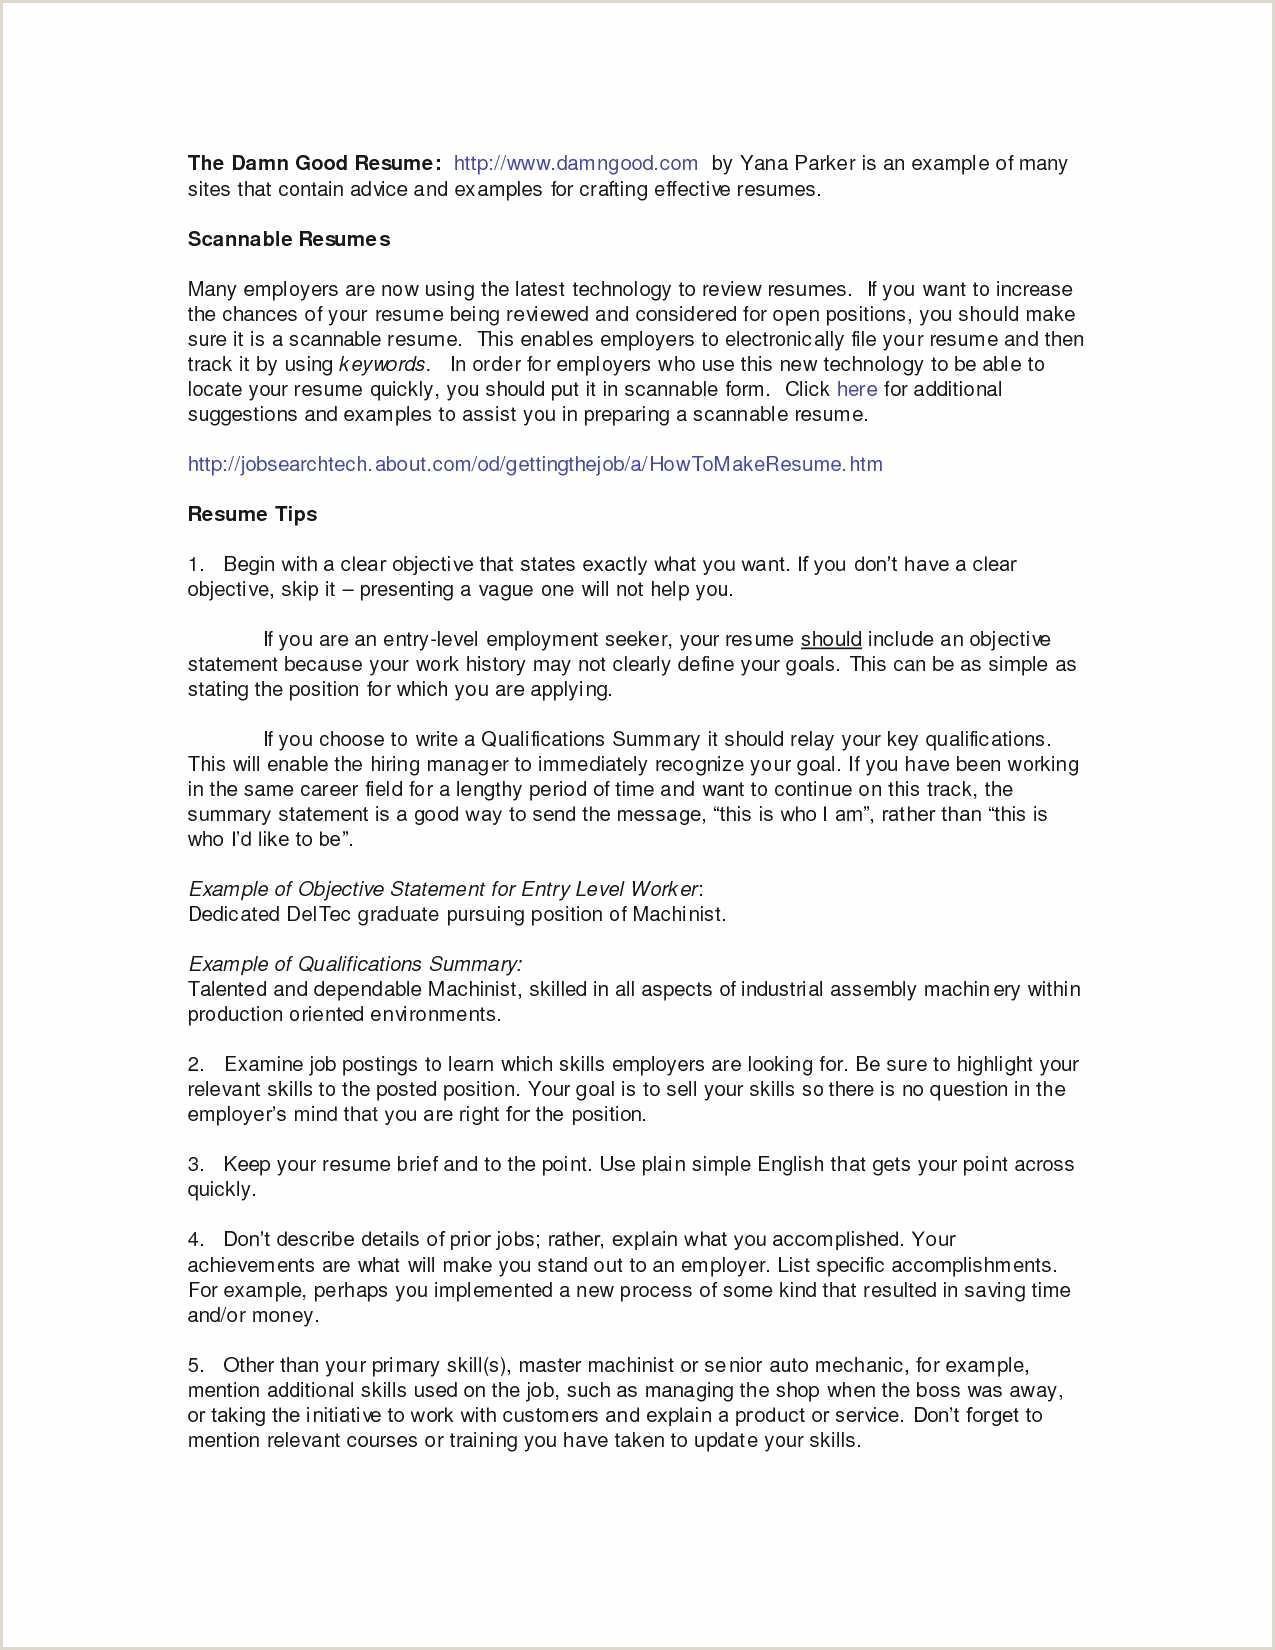 Exemple De Cv Pdf In Romana Modele Cv Pdf De Base New Manager Resume Pdf – Nycloves